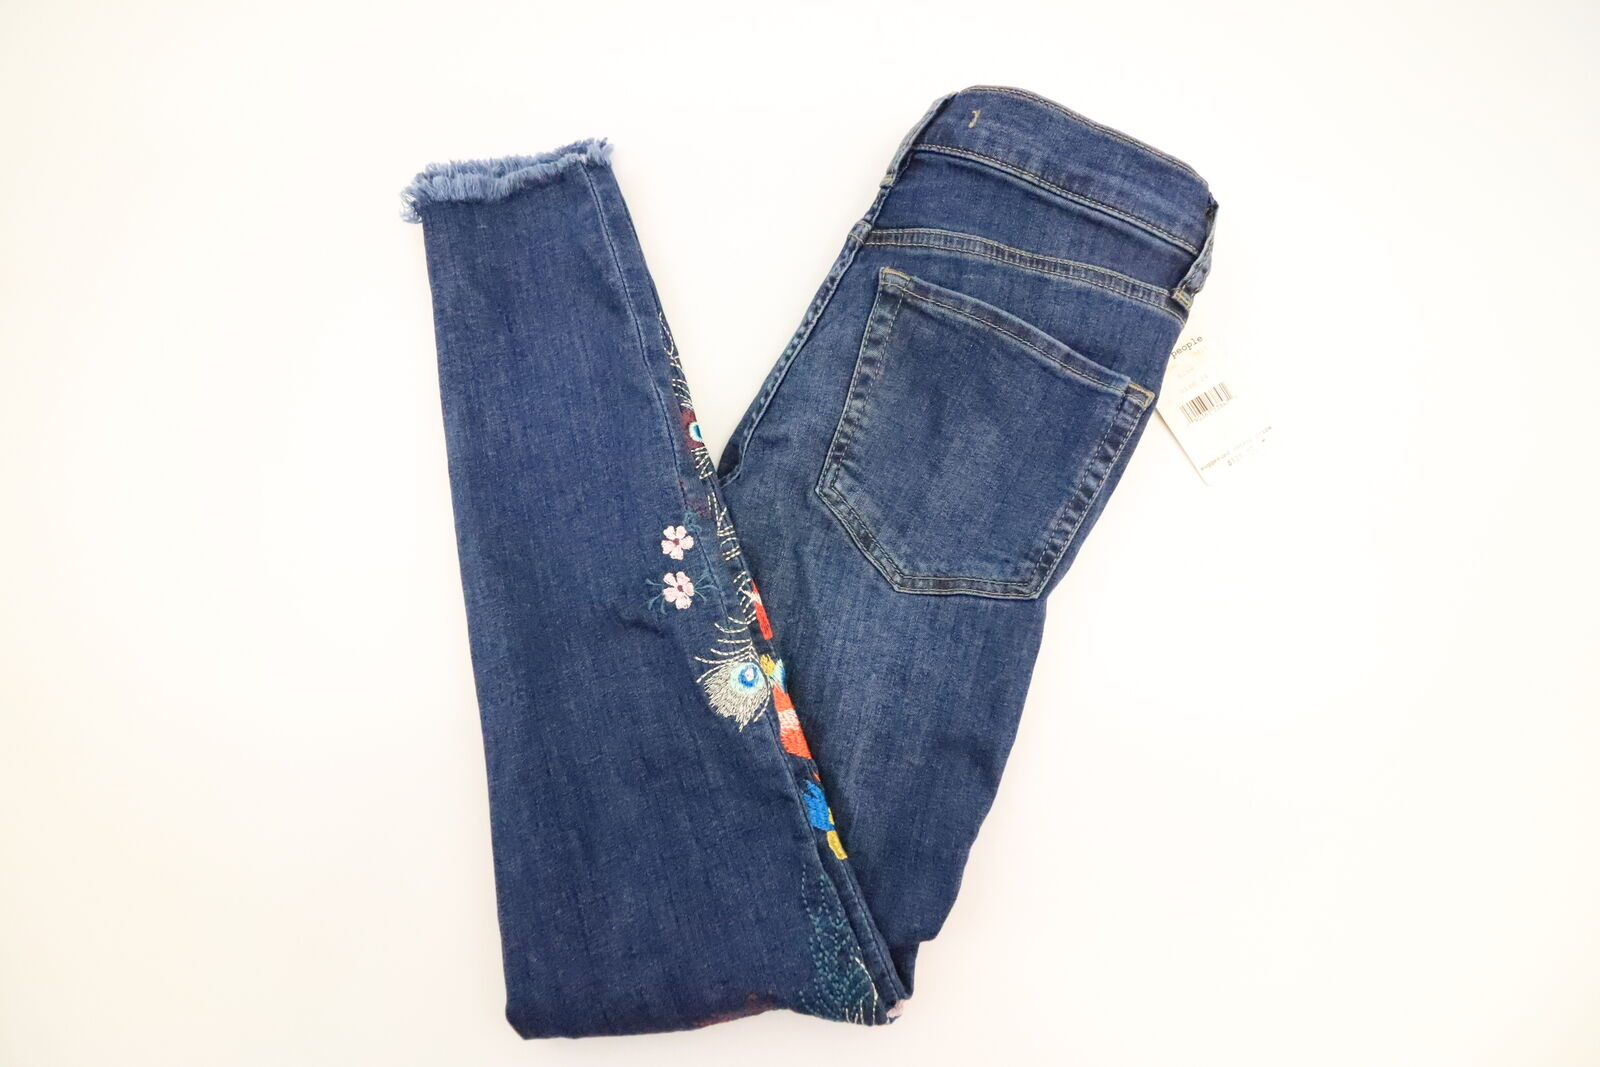 New Free People Embellished Dark Wash Jean Womens Size 24